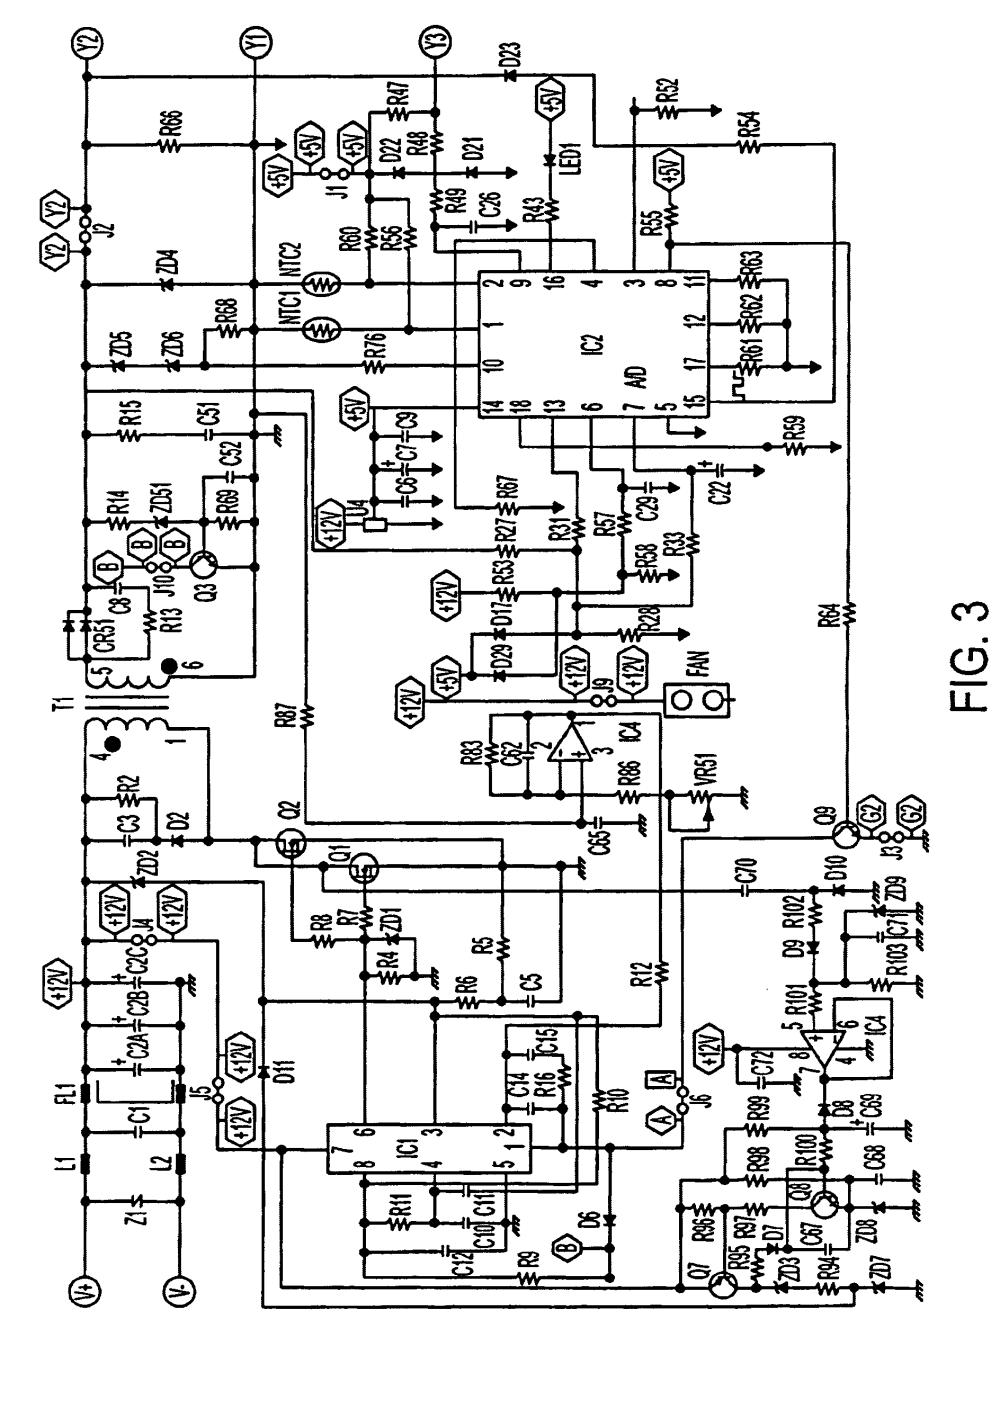 medium resolution of makita wiring diagram wiring diagram go makita 9227c wiring diagram